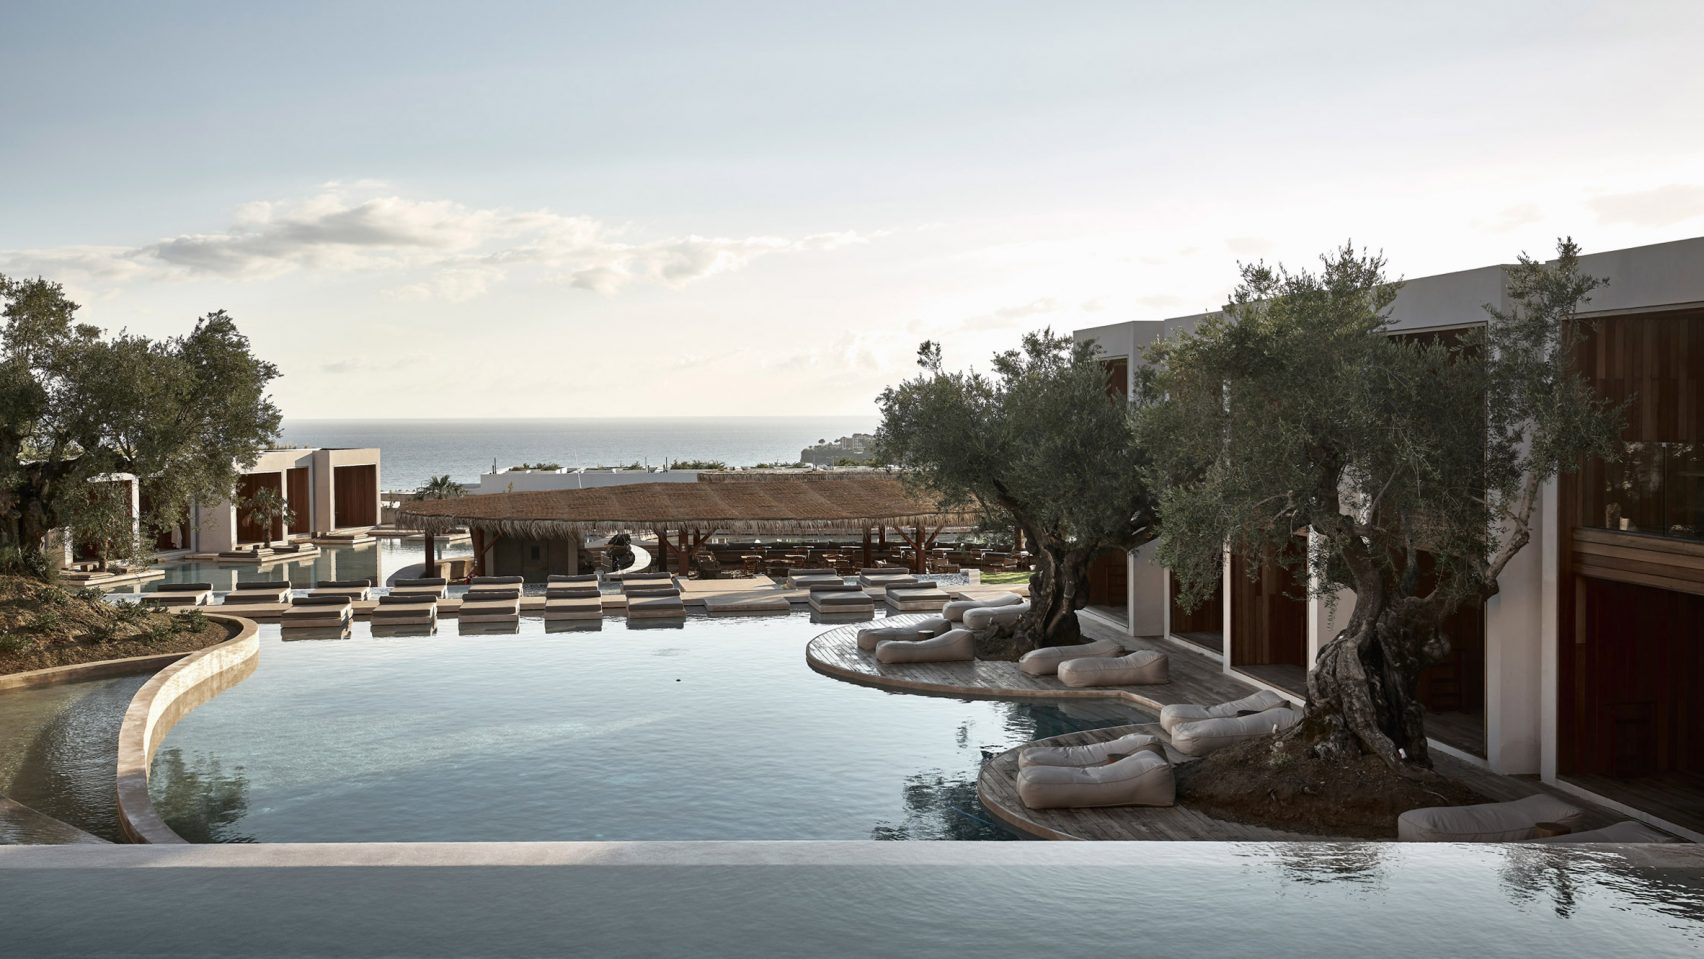 nội thất khách sạn olea-hotel-block722-elledecorationvn-relaxingspace-6